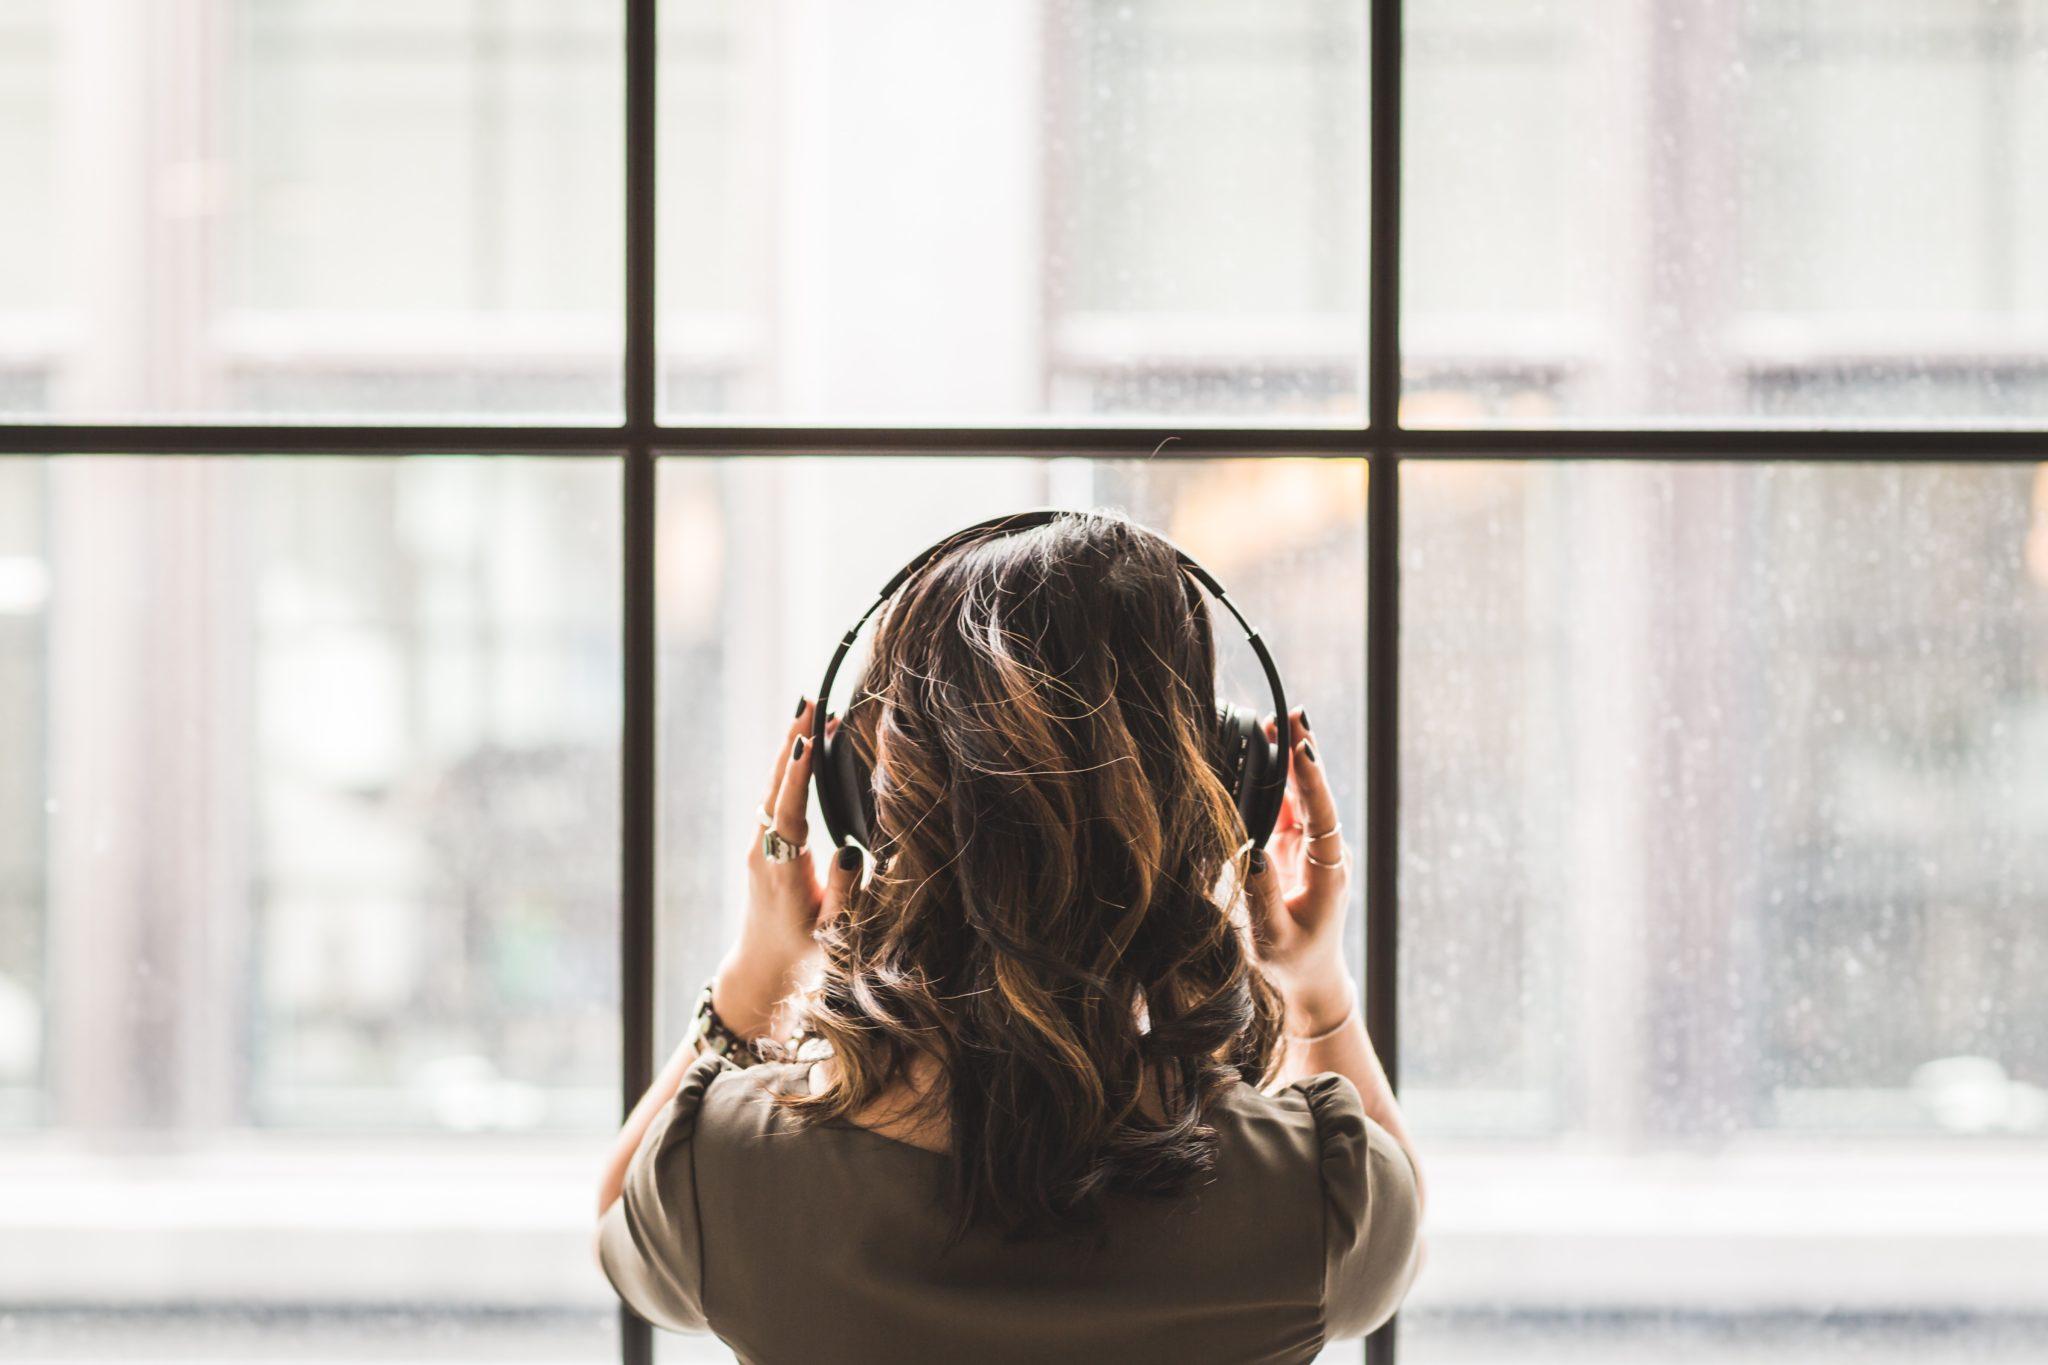 PTEアカデミック Summarize Spoken Text テンプレートと練習教材